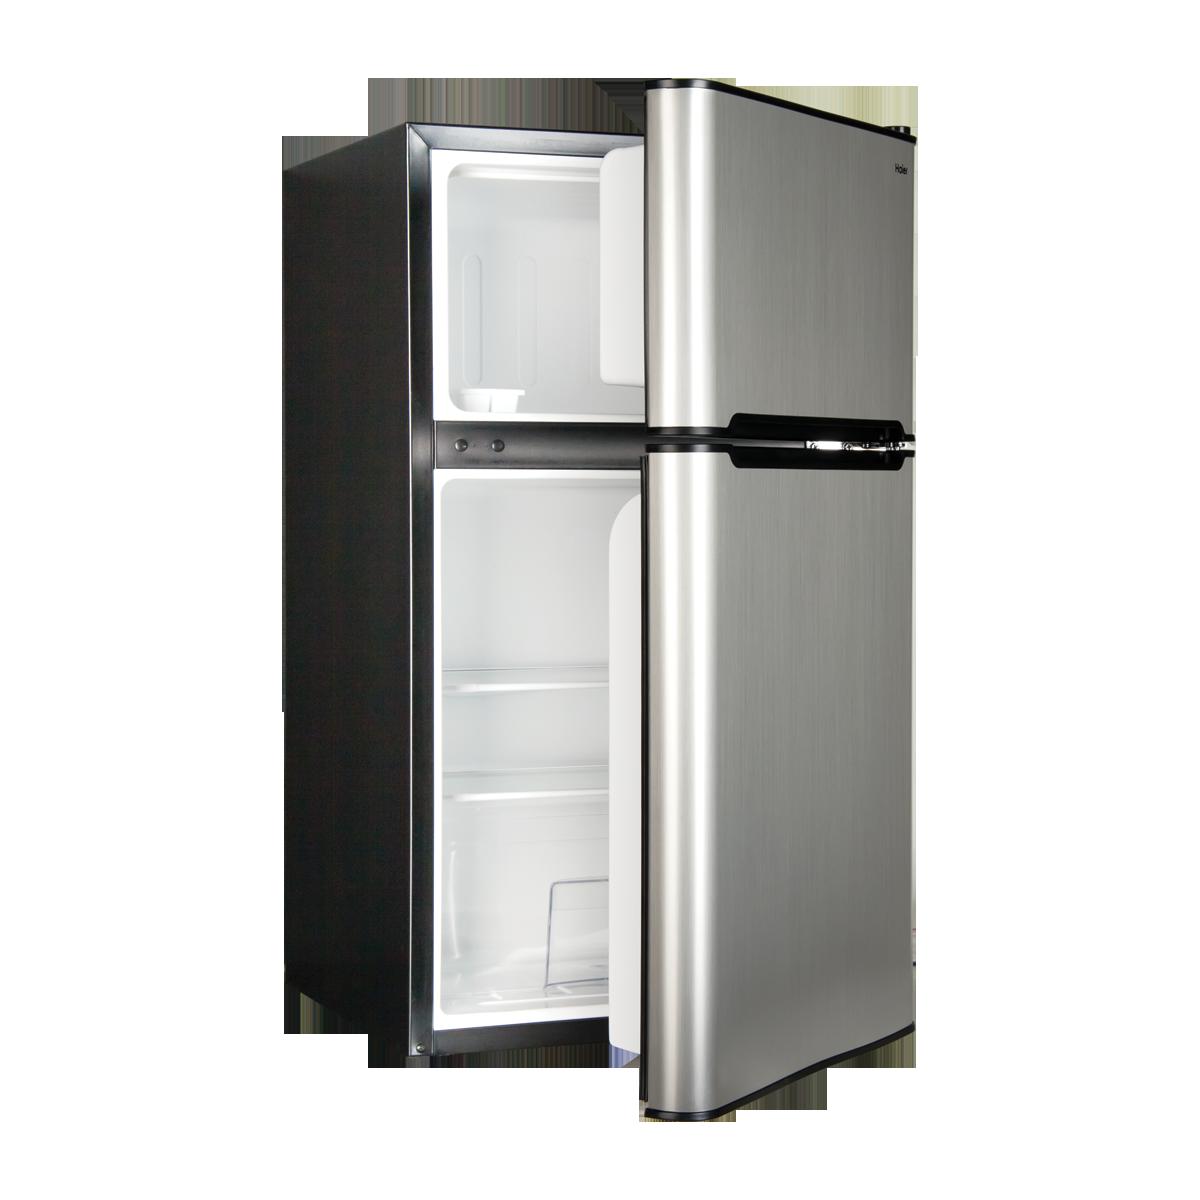 Refrigerator PNG Image.